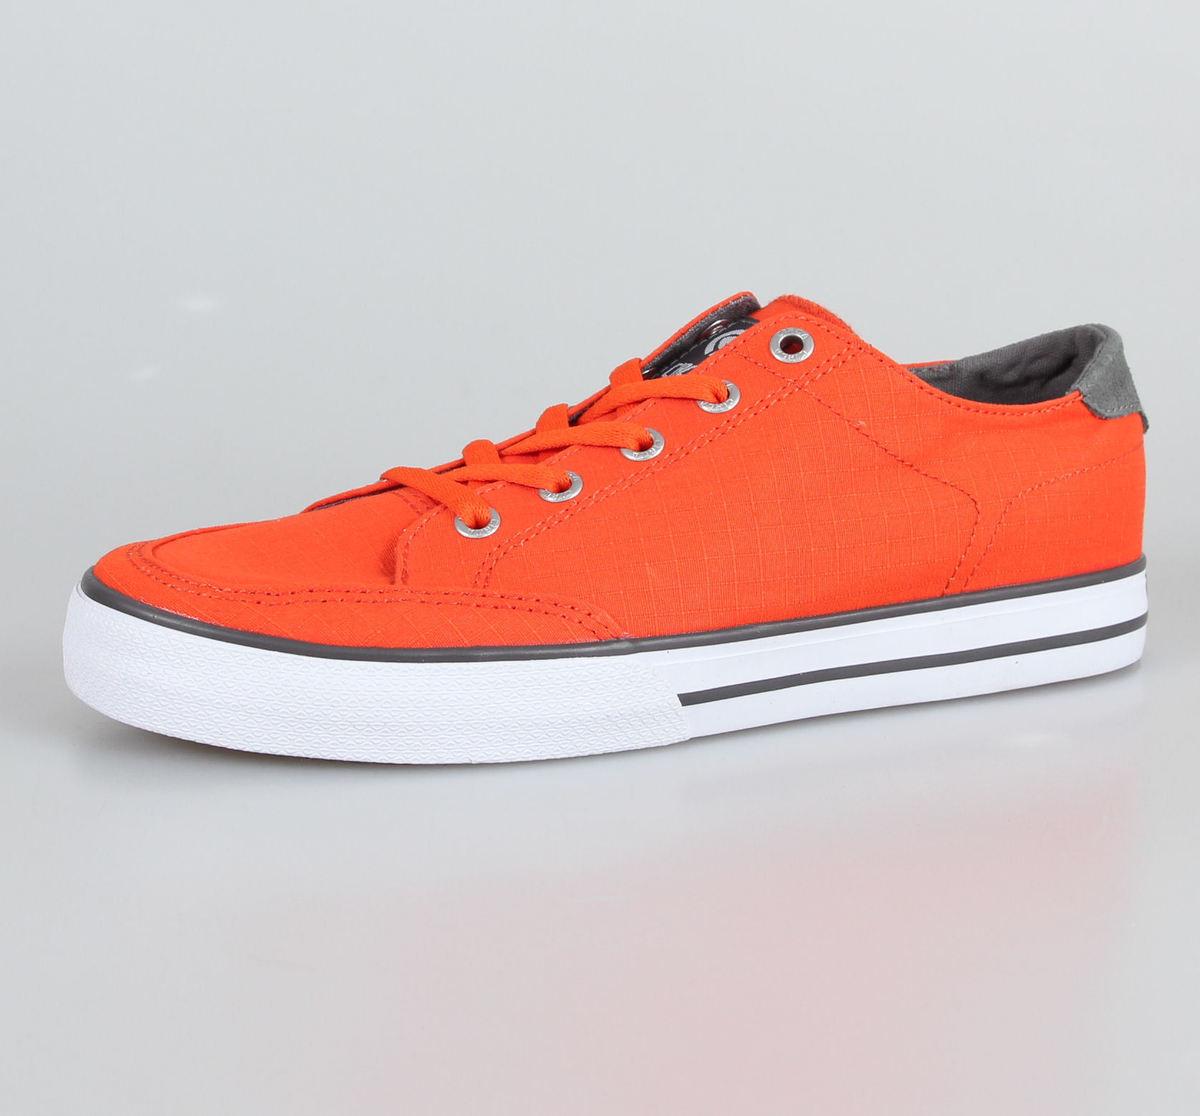 boty pánské CIRCA - 50 Classic - Red/Orange